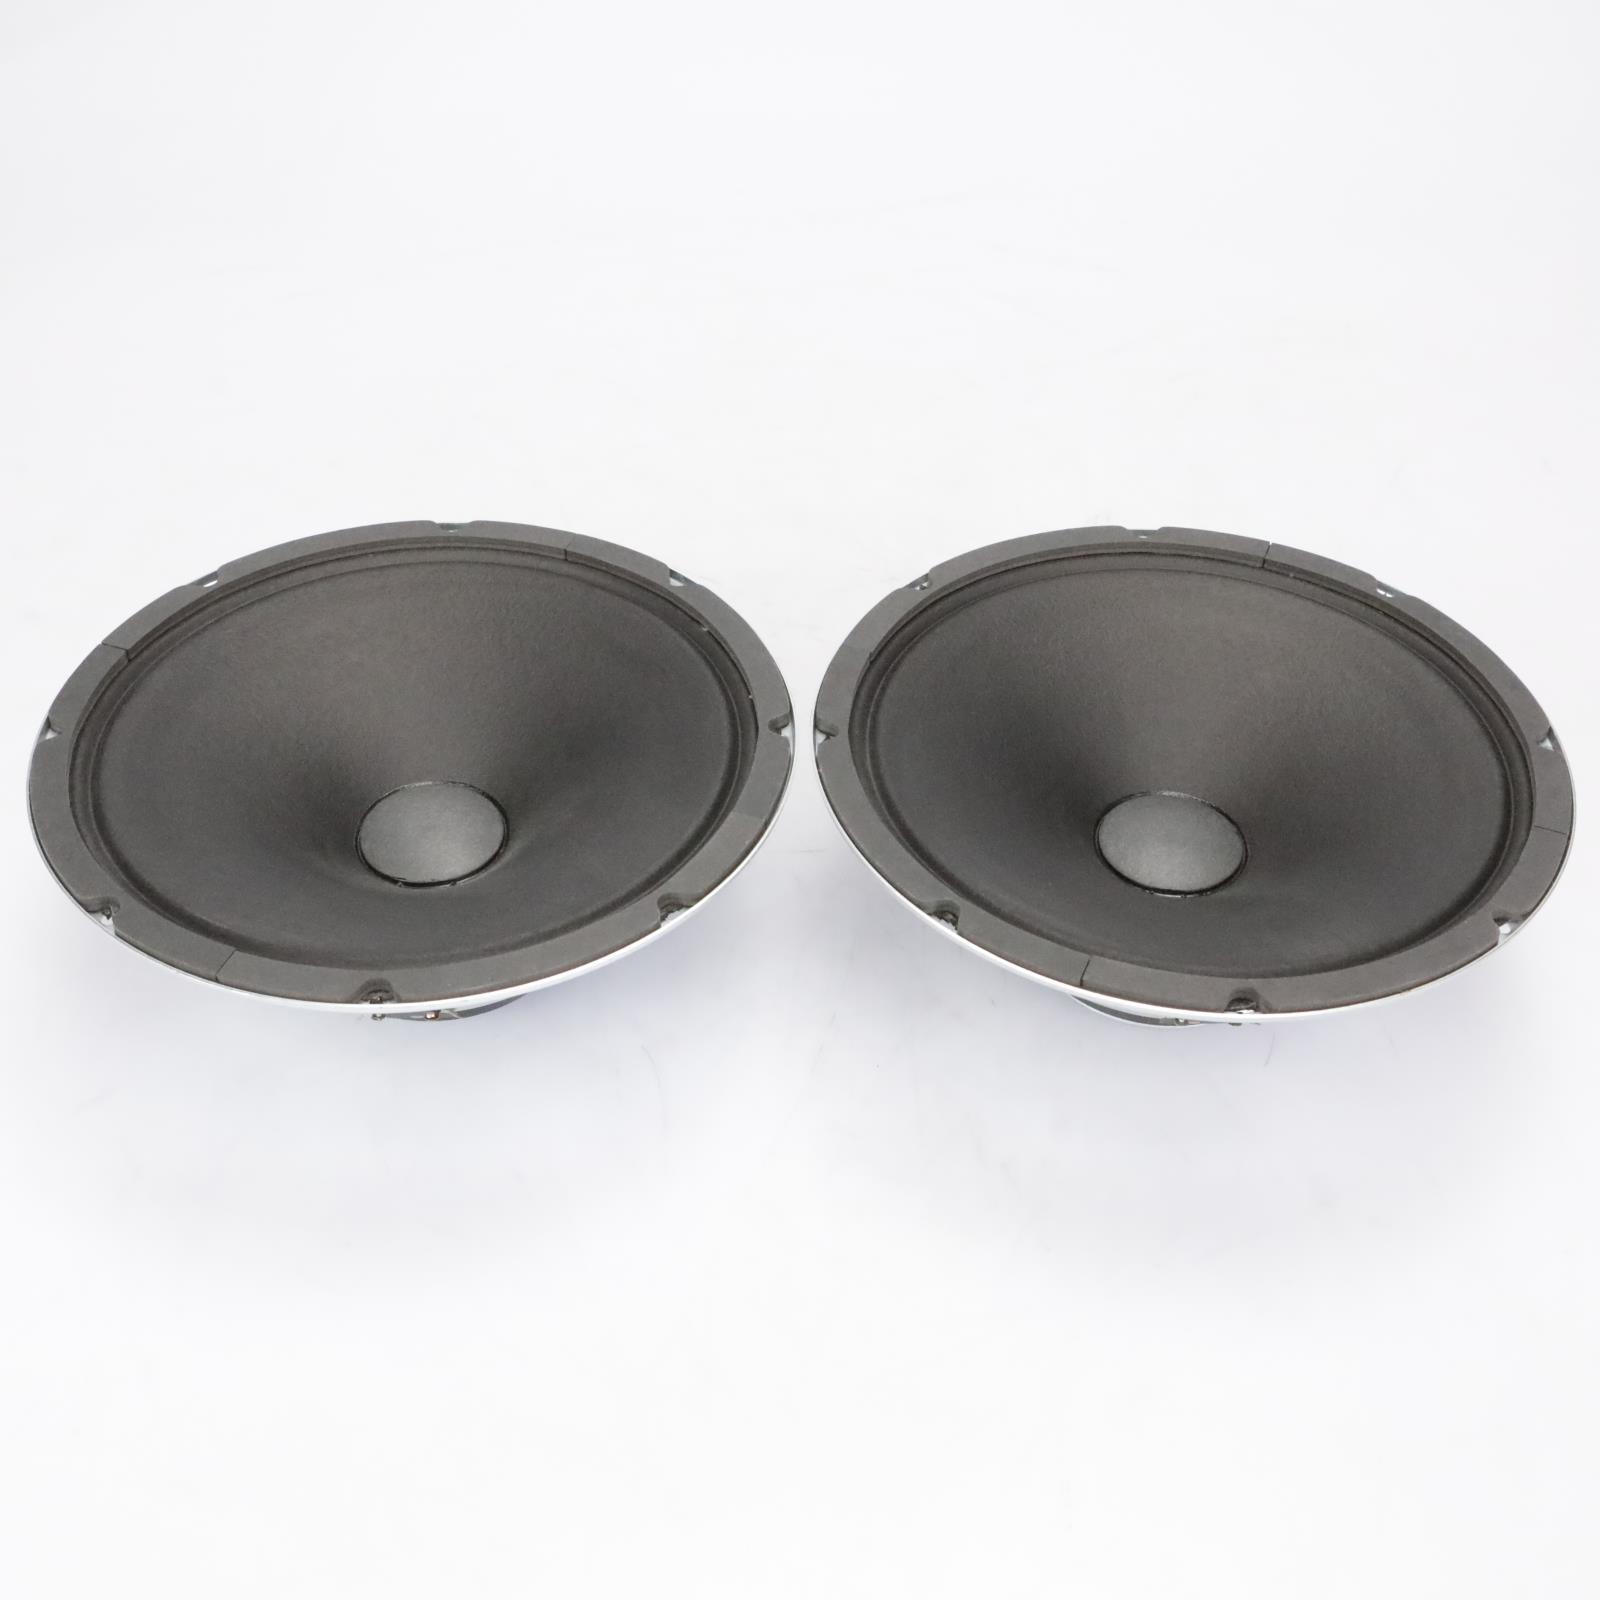 "2 Unbranded 12"" Guitar Amp 8 ohm Speakers #42138"